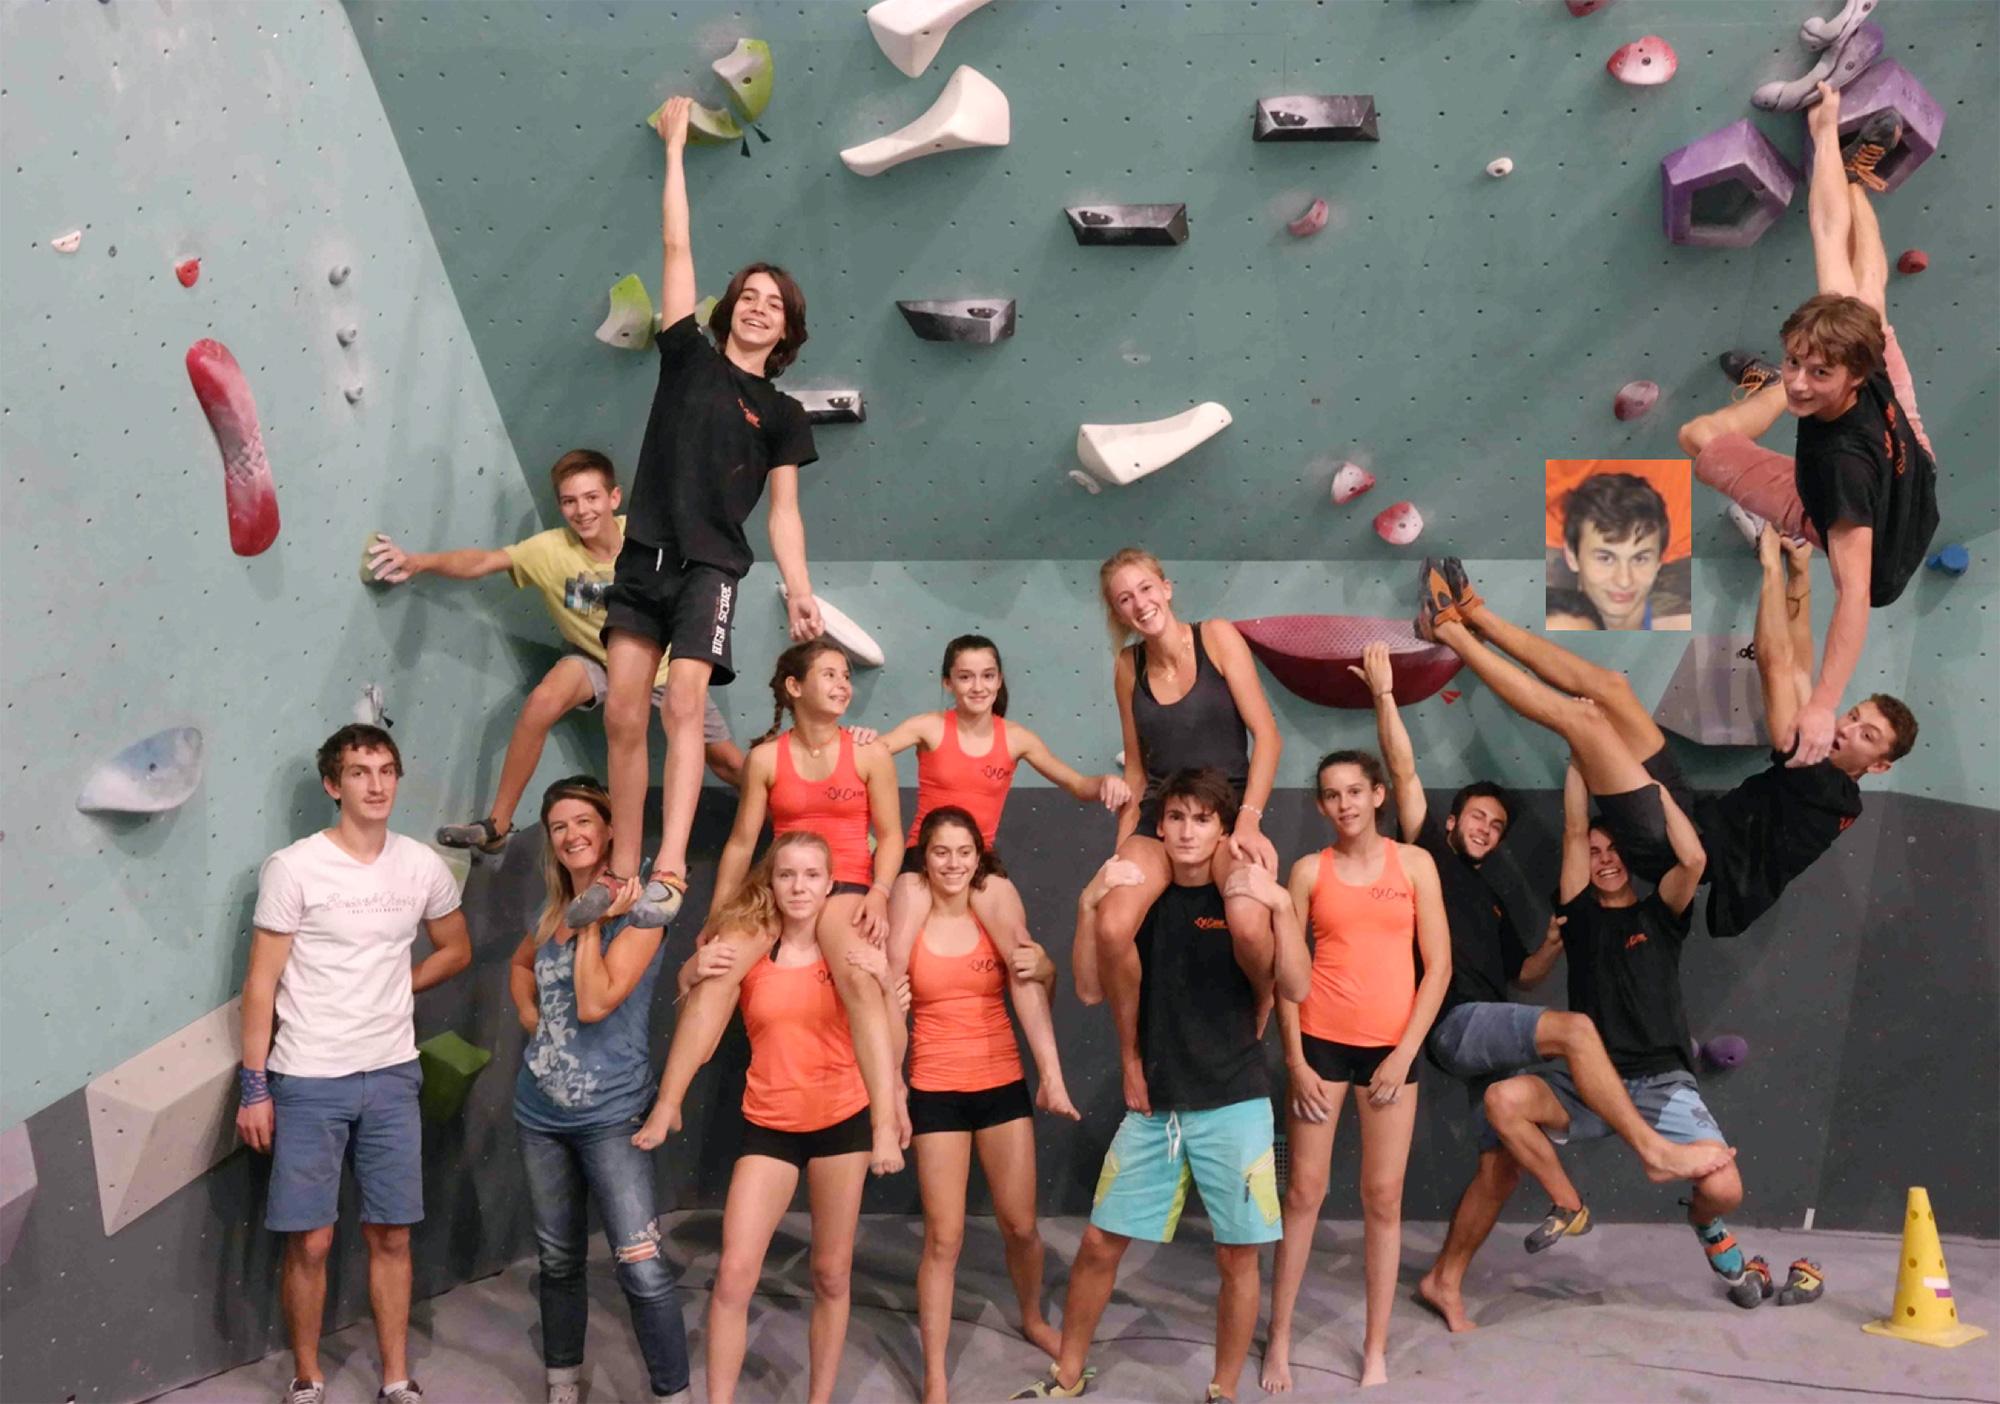 equipe-competition-la-degaine-escalade